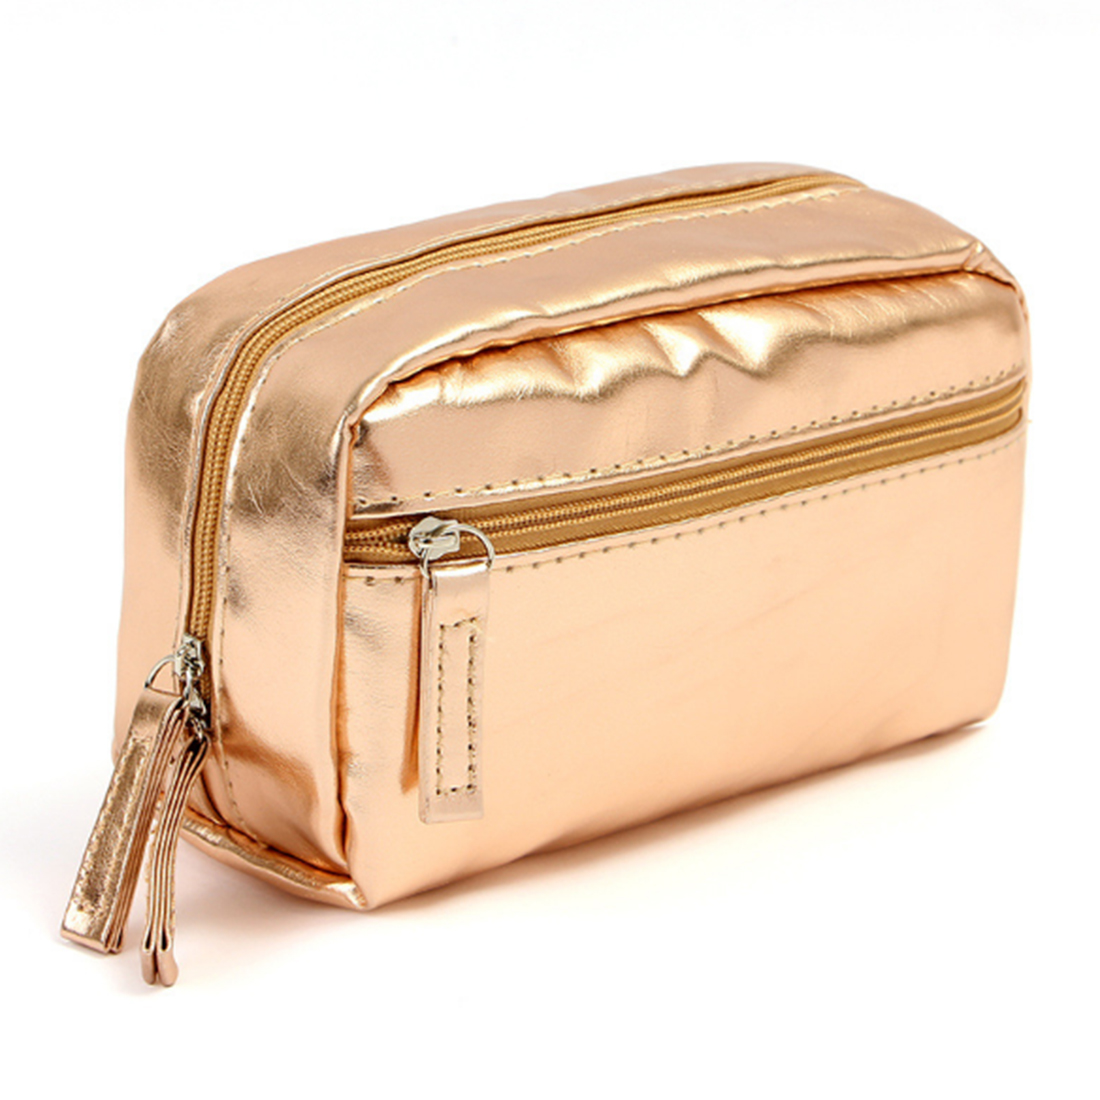 HIPSTEEN Portable Cosmetic Bag